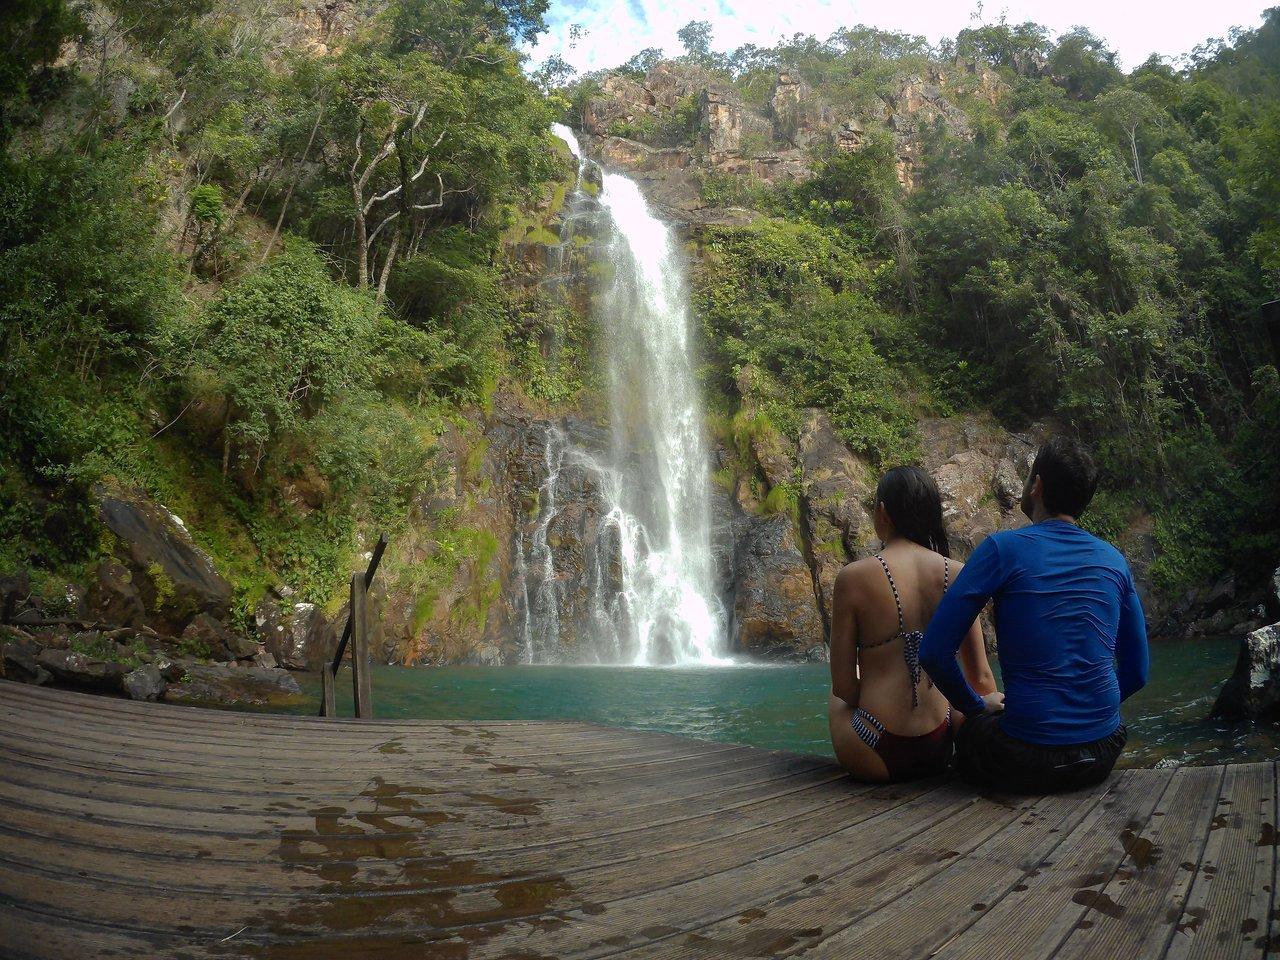 Cachoeira Serra Azul Nobres Atualizado 2020 O Que Saber Antes